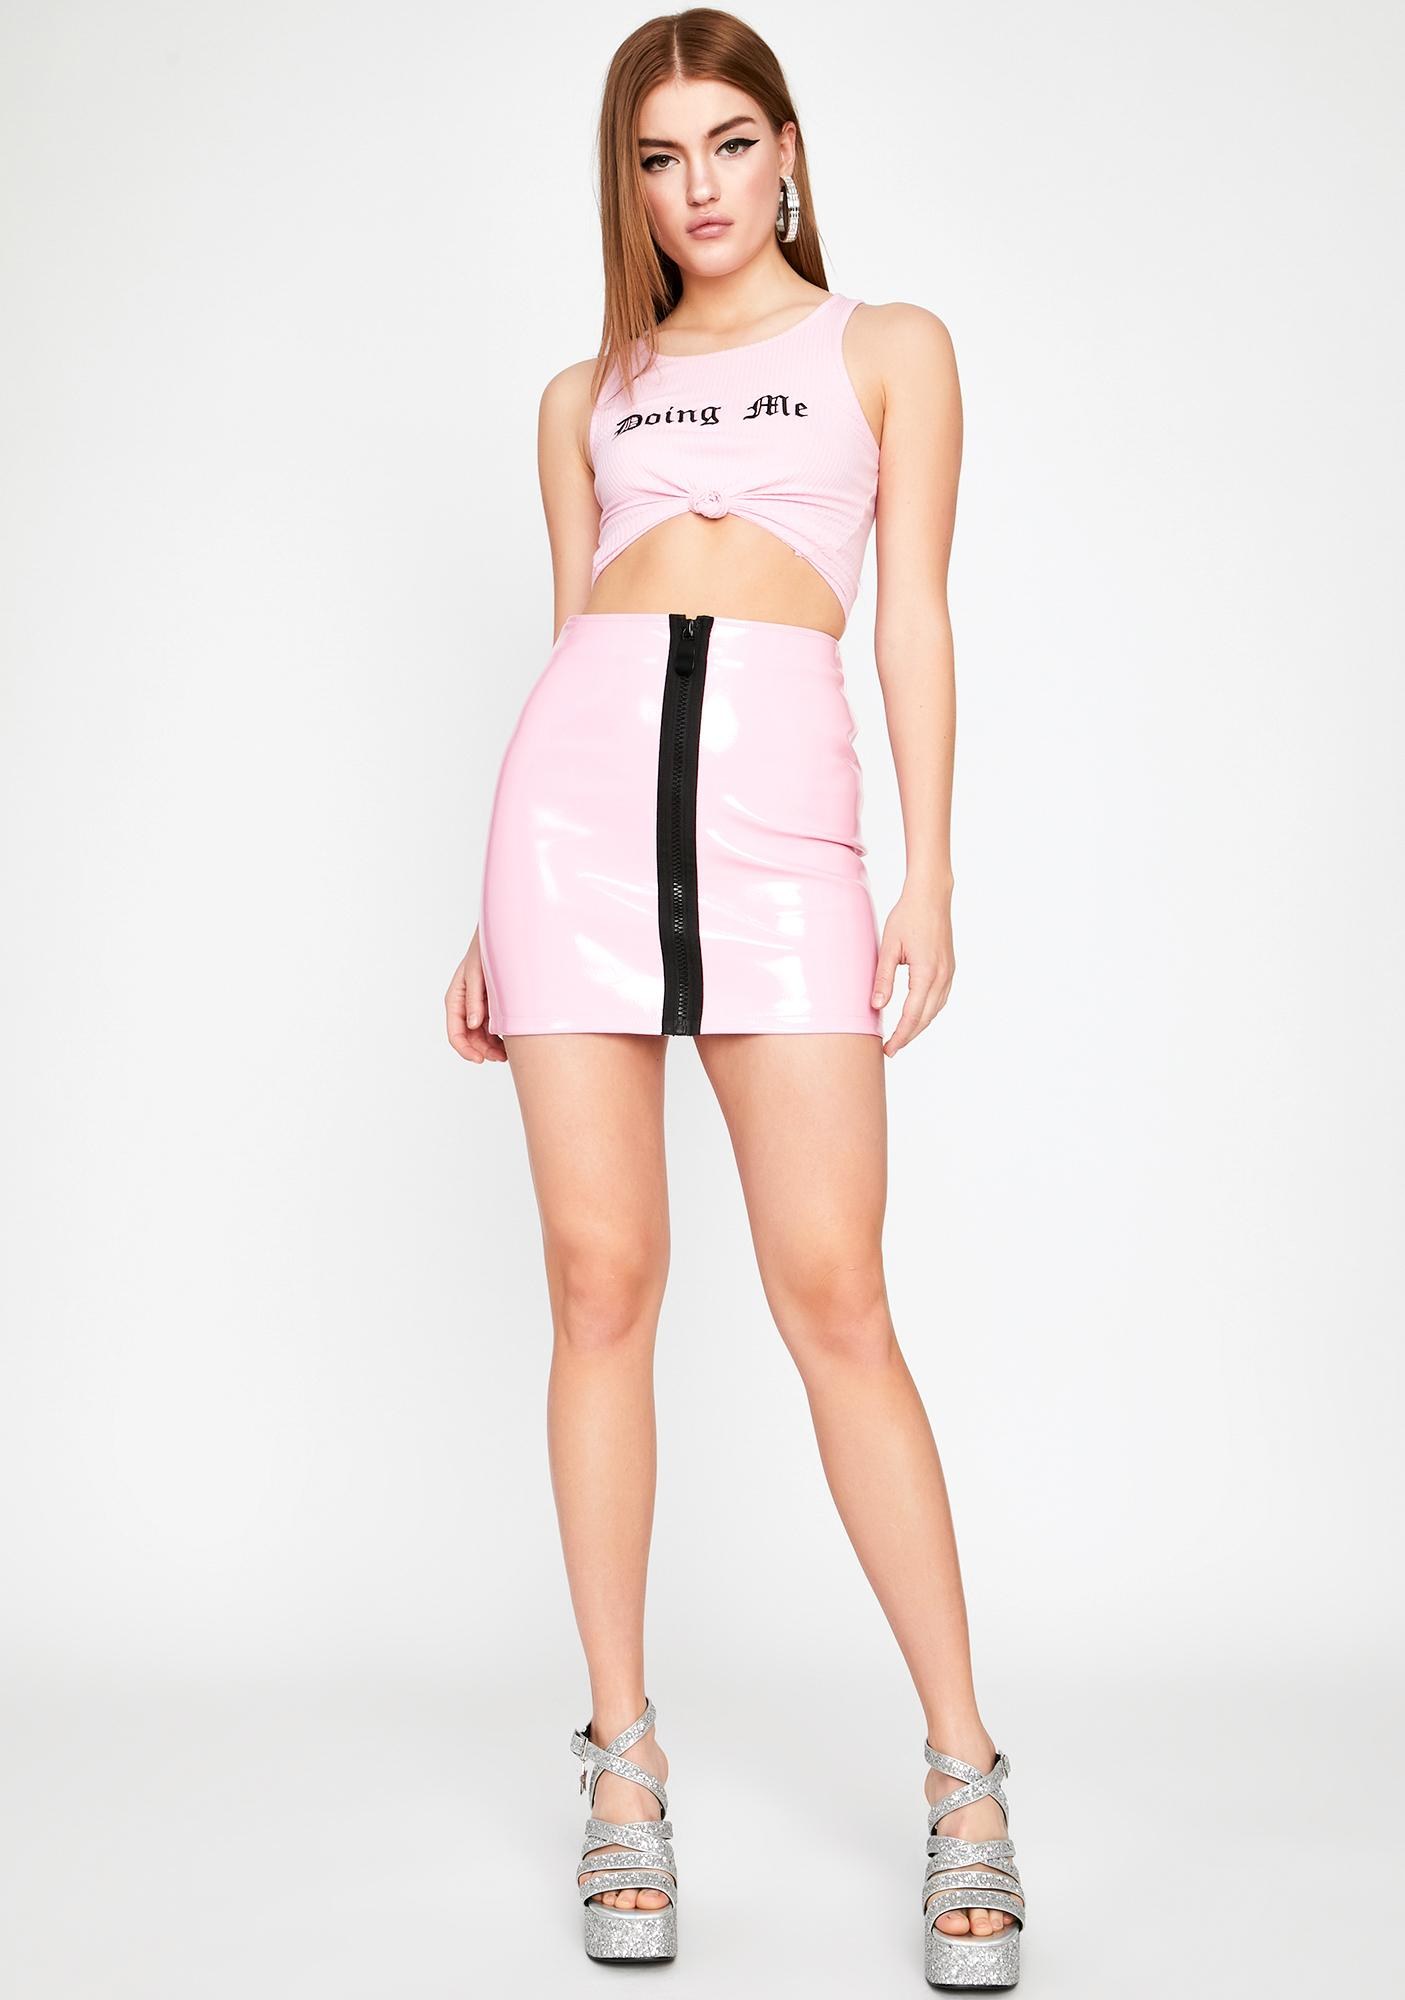 Posh Addiction Vinyl Skirt